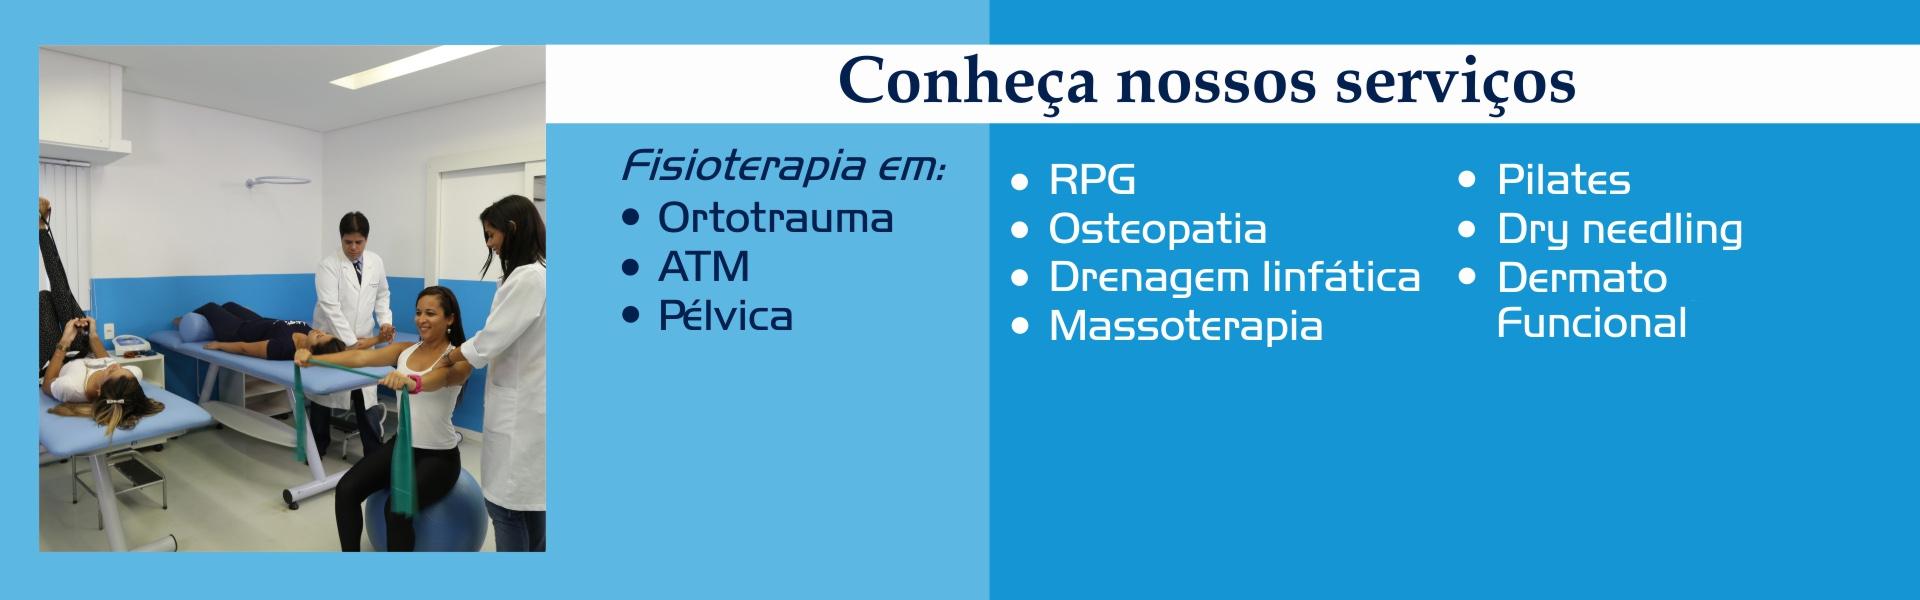 serviços-20160331